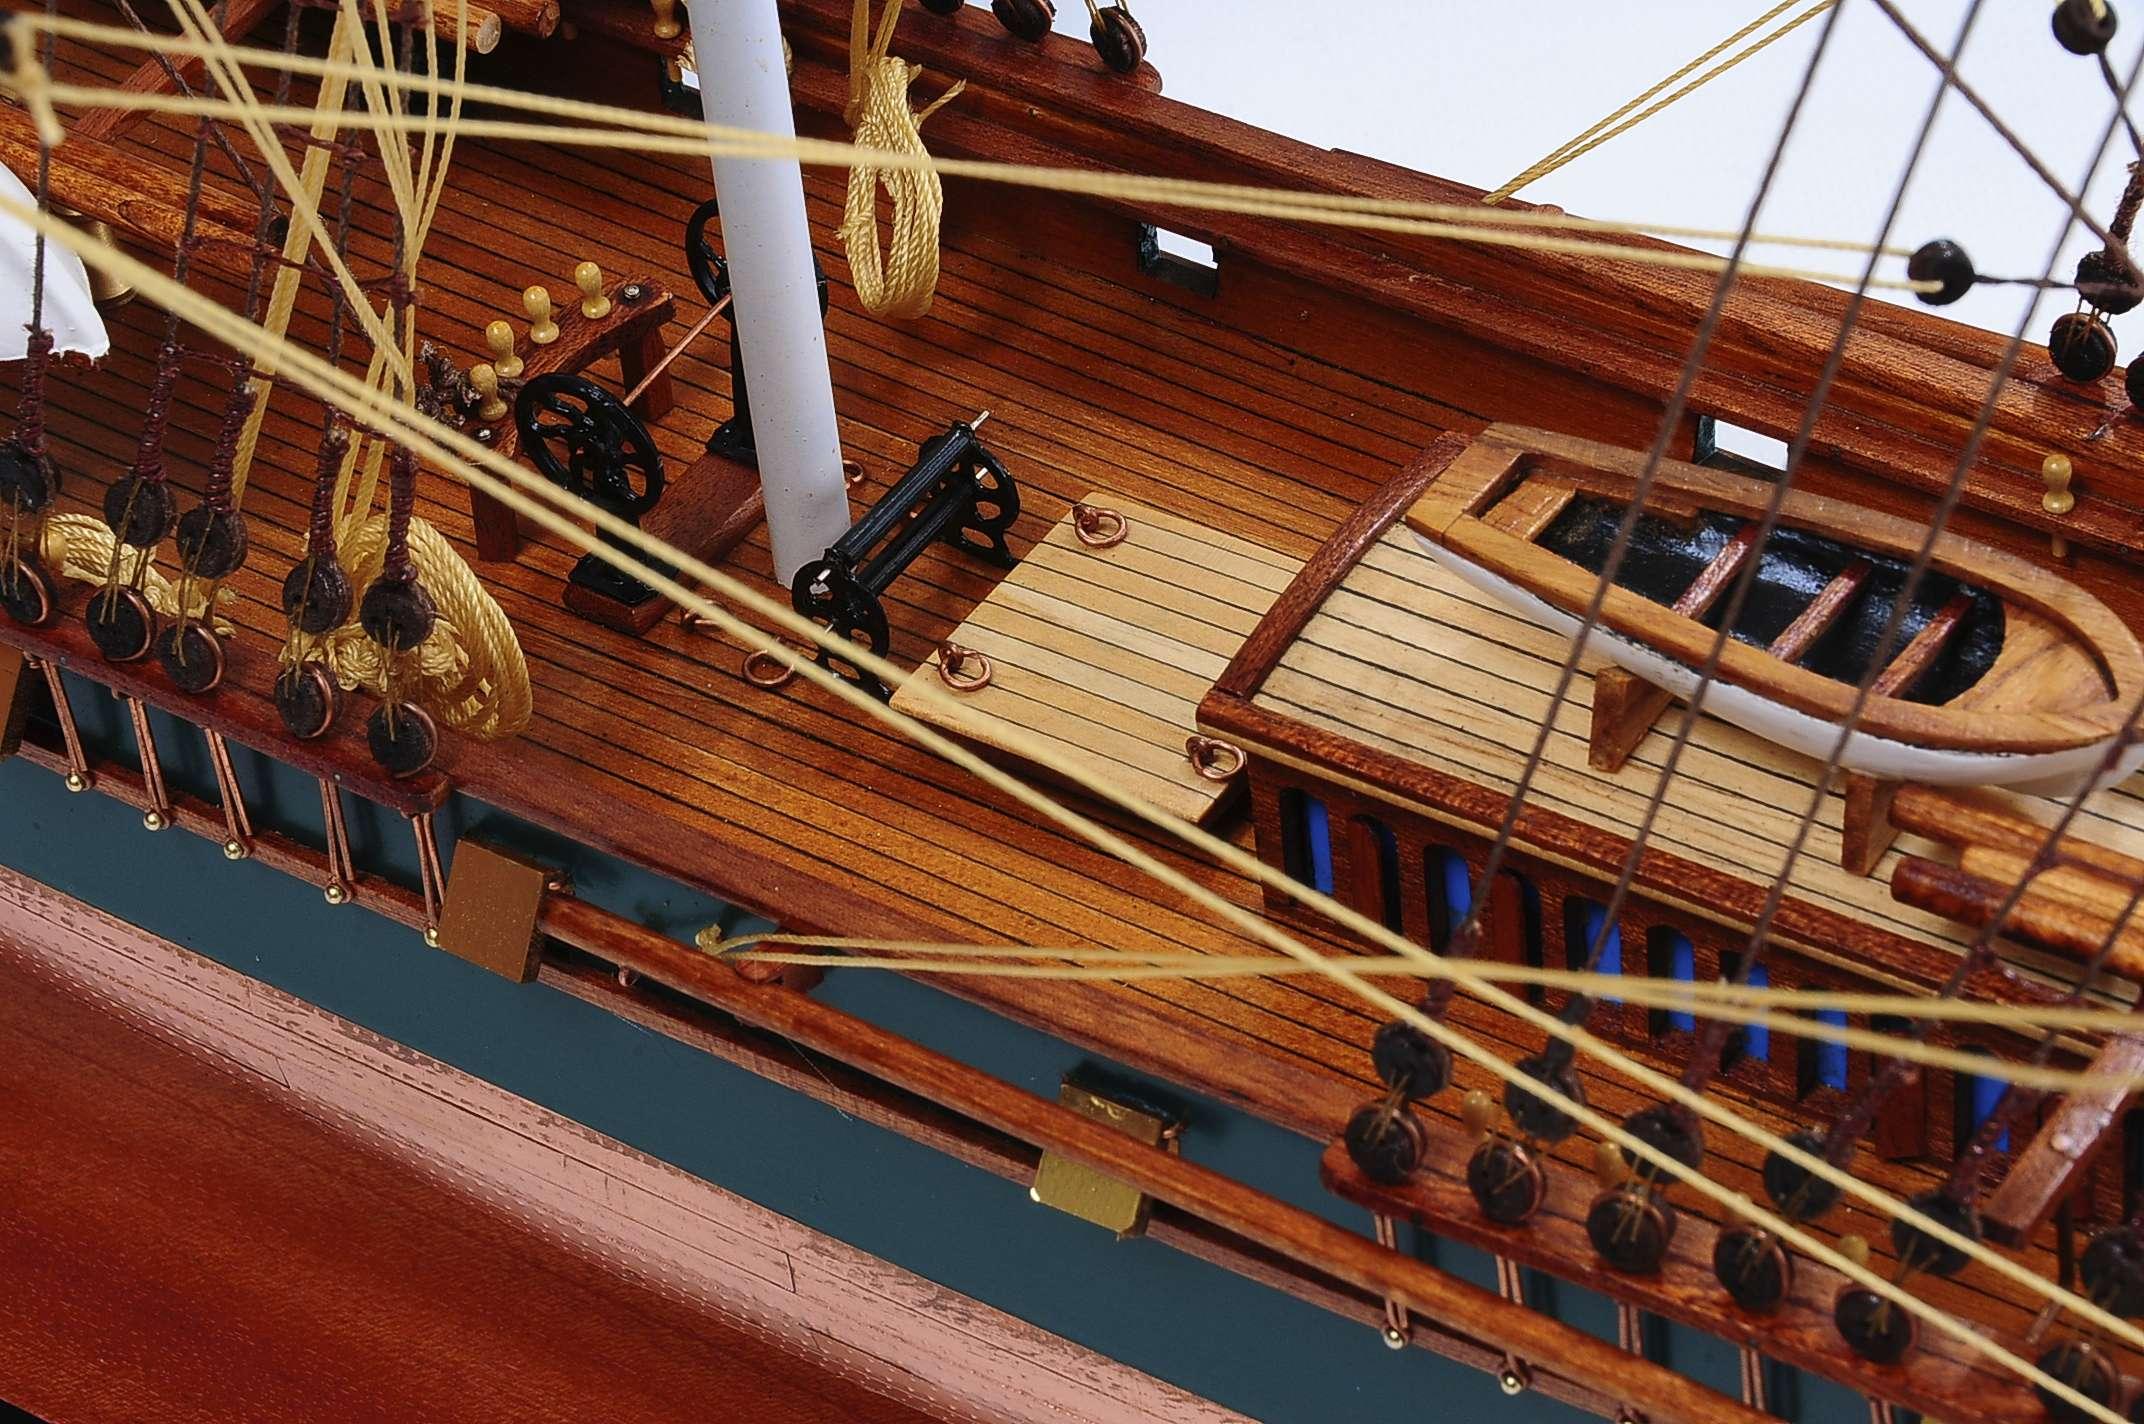 1434-4870-Thermopylae-Model-Boat